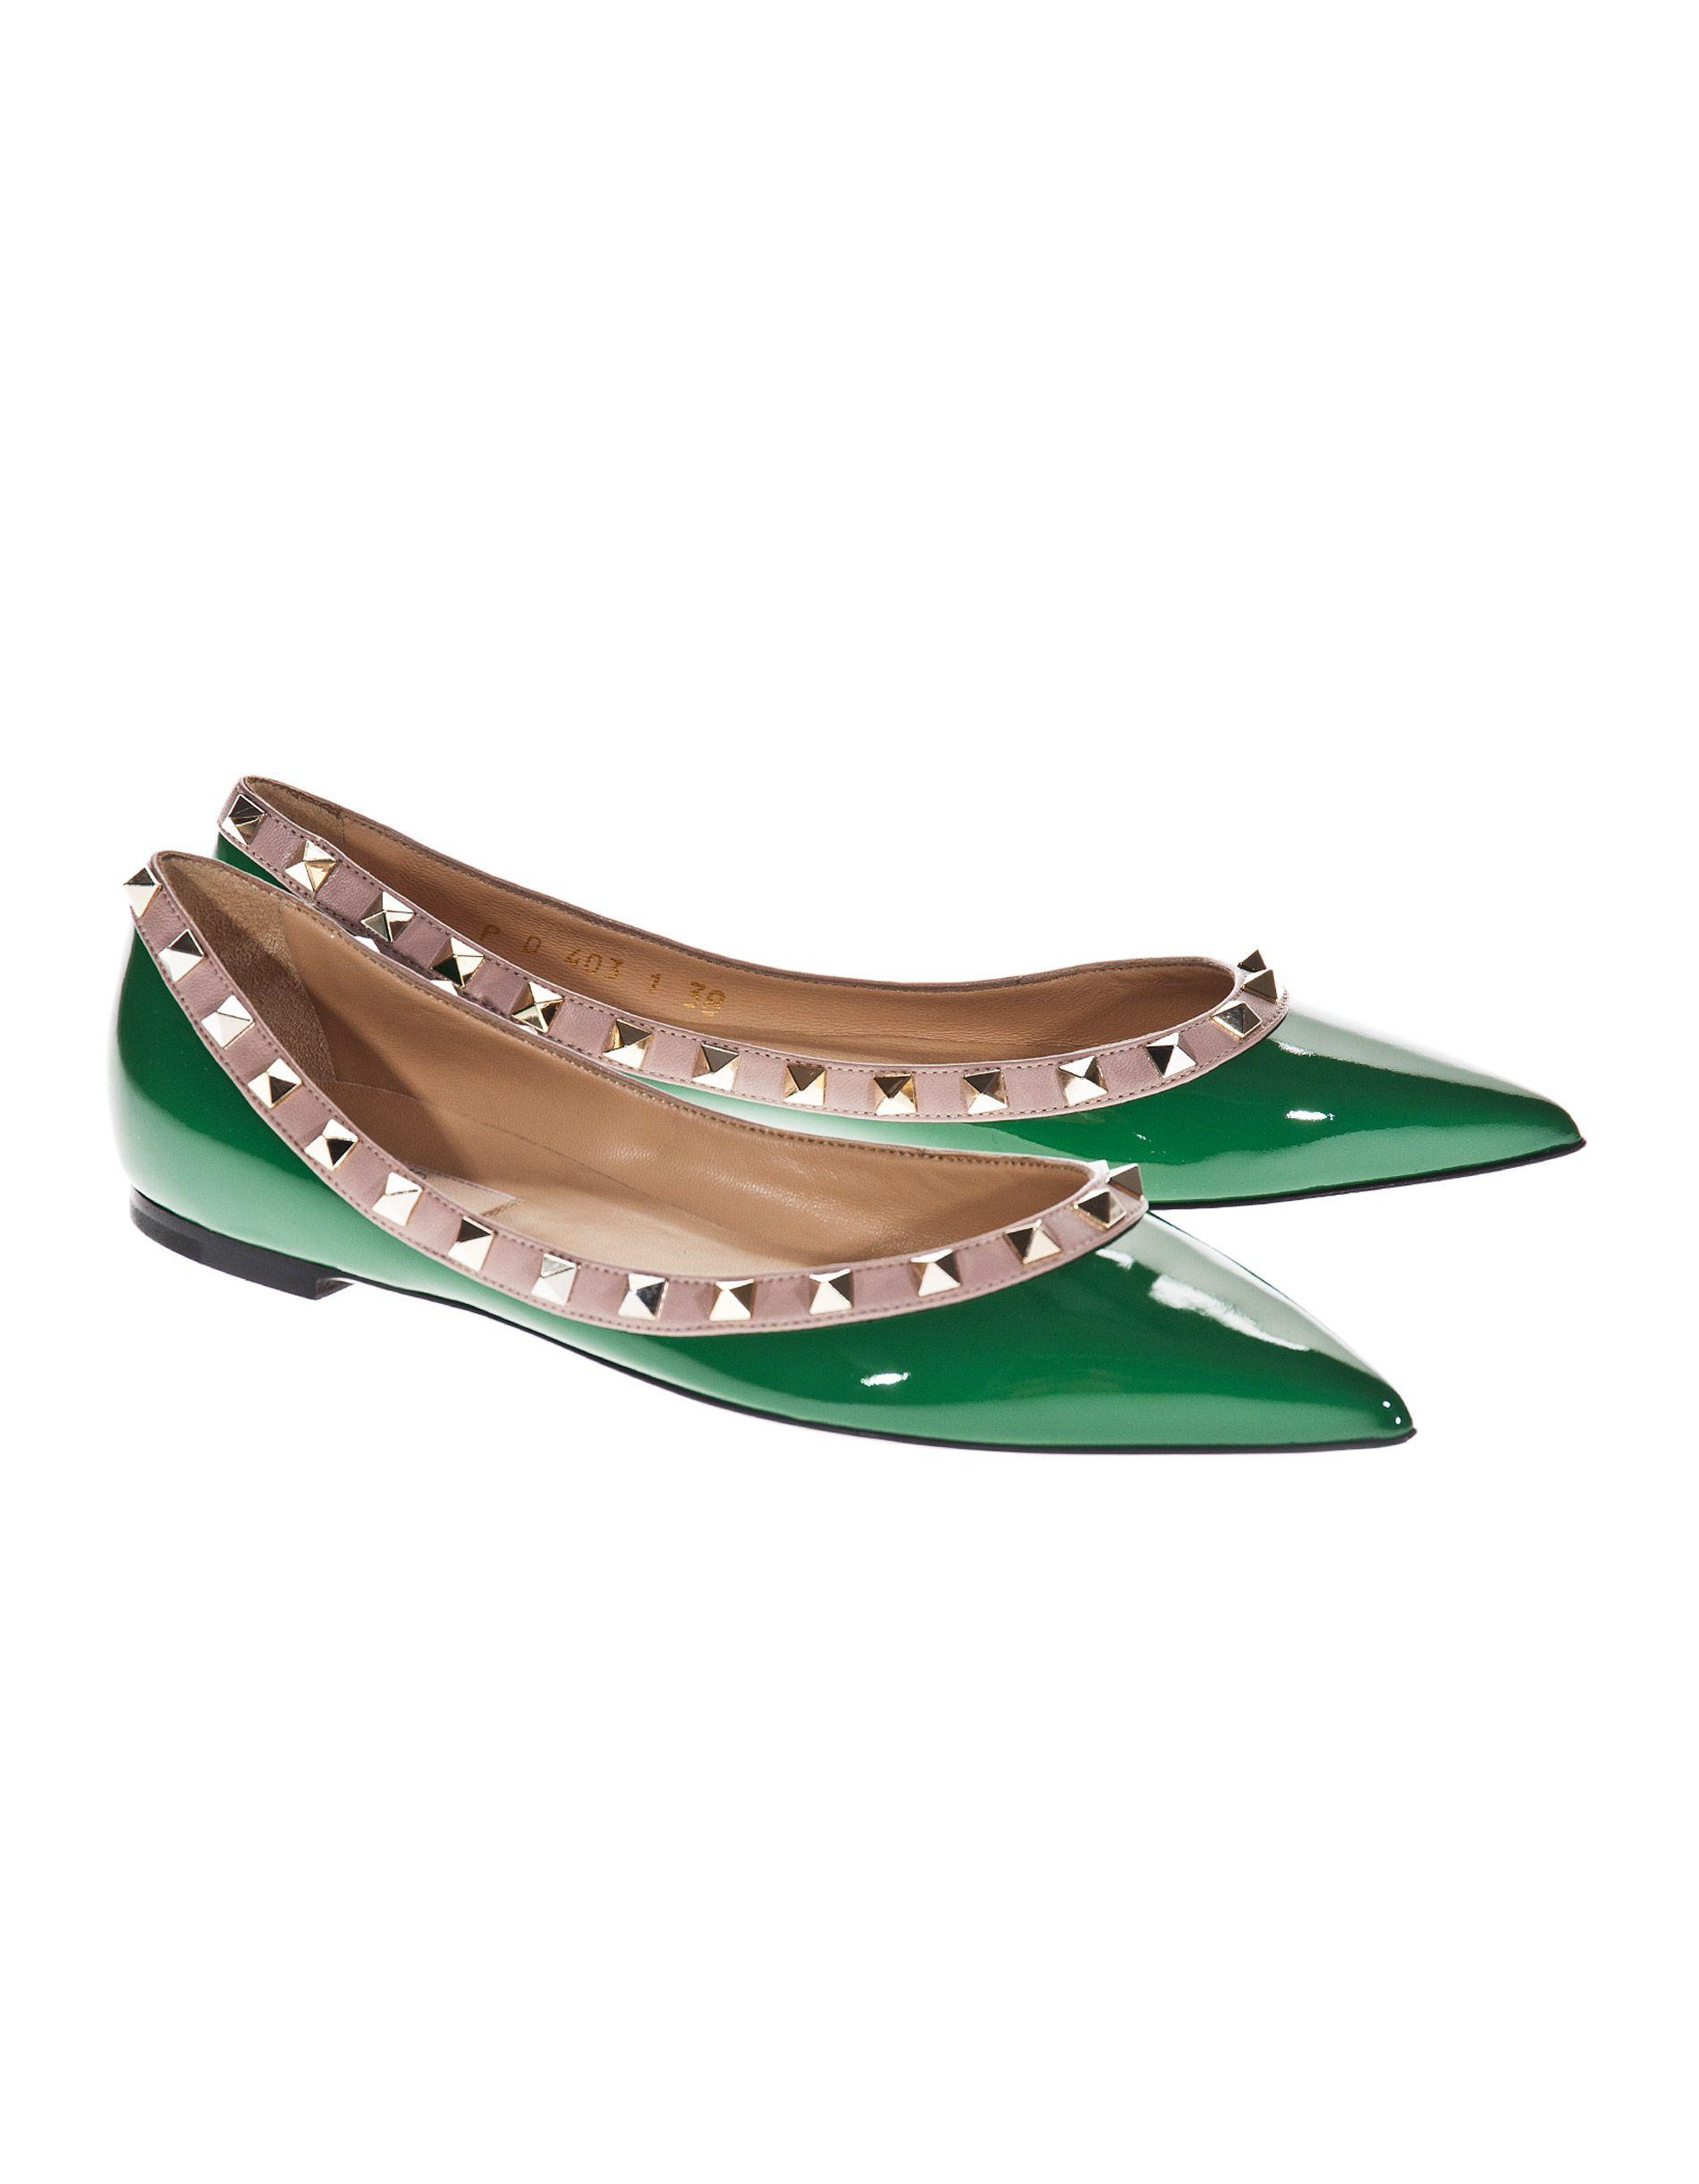 VALENTINO Patent Ballet Rockstud Green Studded patent leather flats - Flats